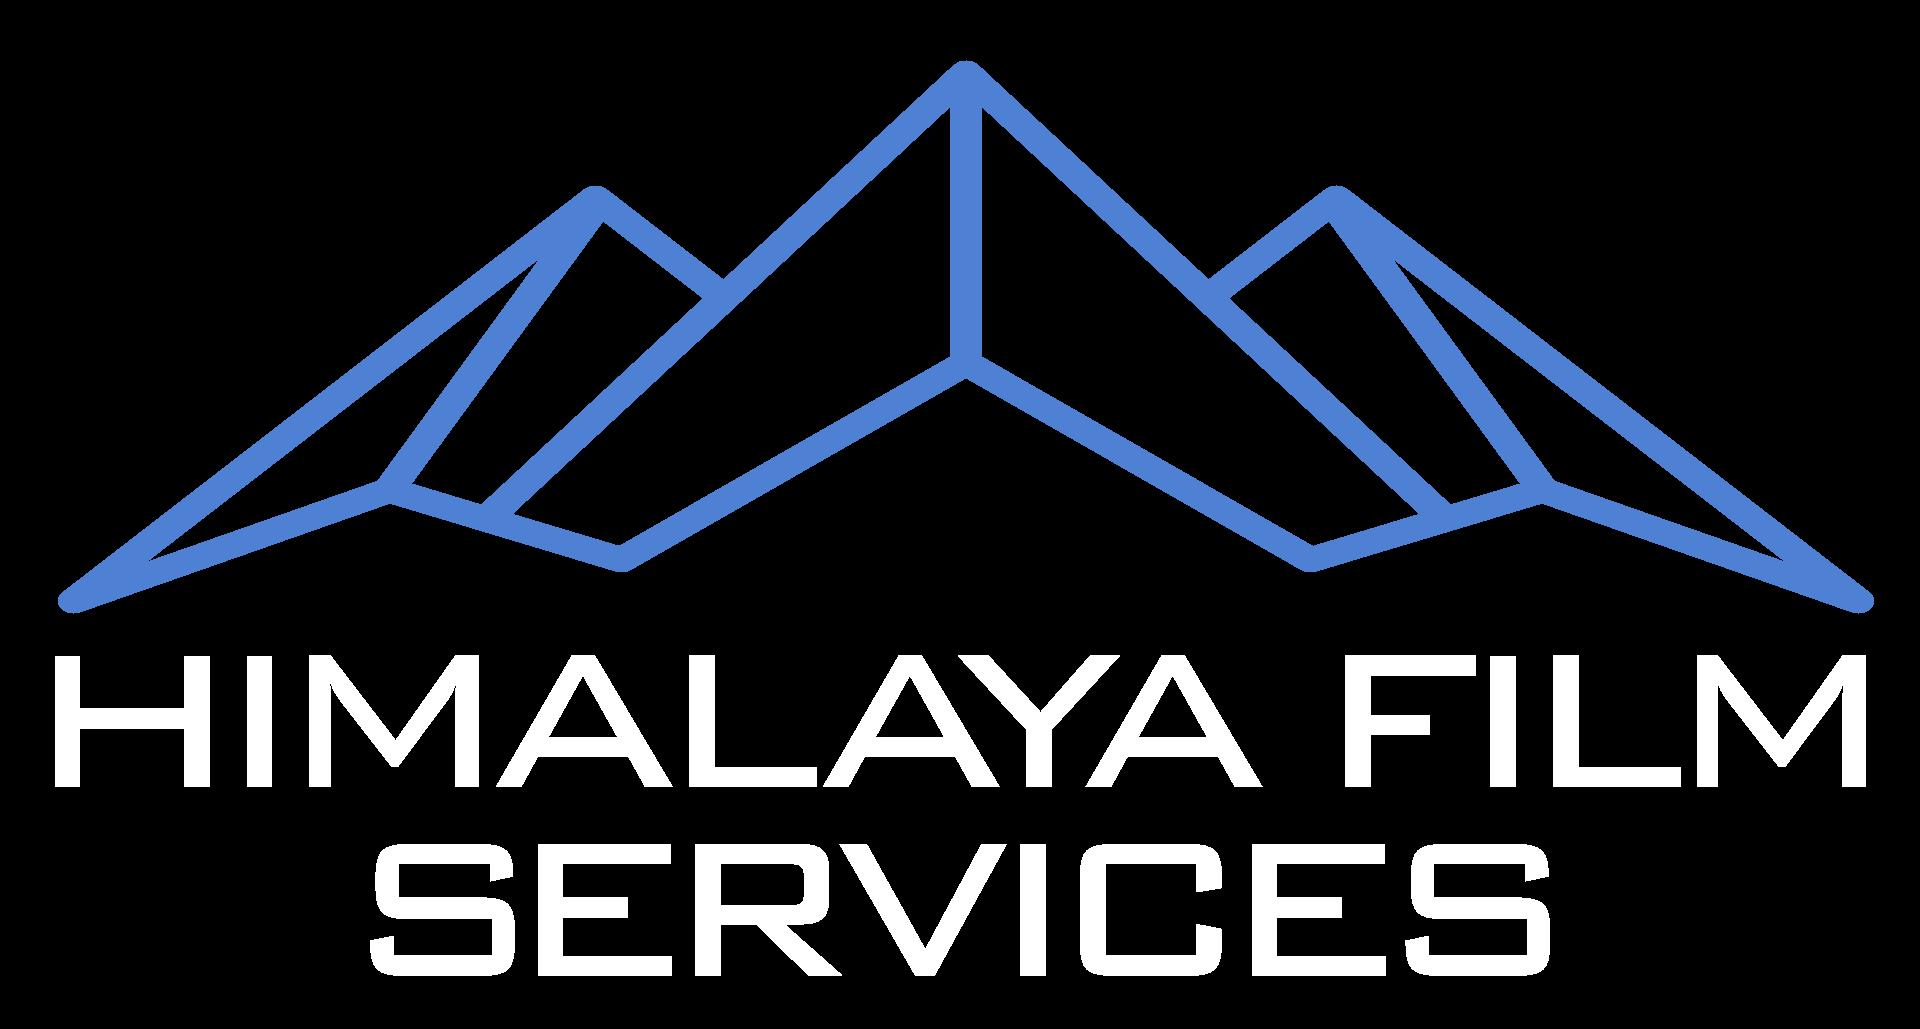 Himalaya Film Services